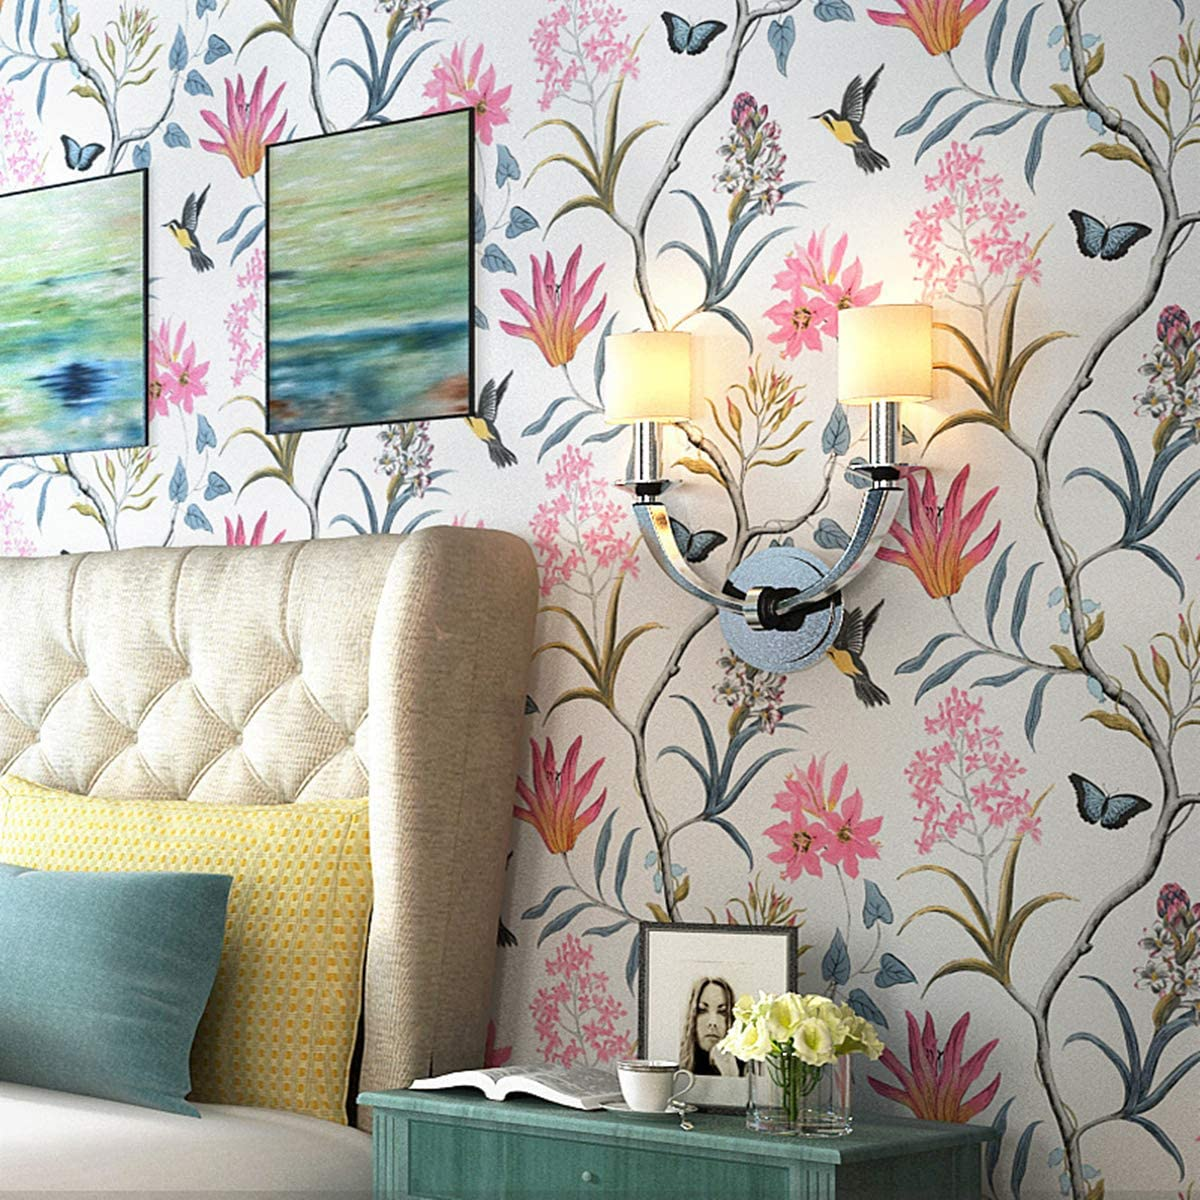 LIKE SHOP Wallpaper roll Vintage Birds Super intense SALE Fresh New popularity Floral 1.